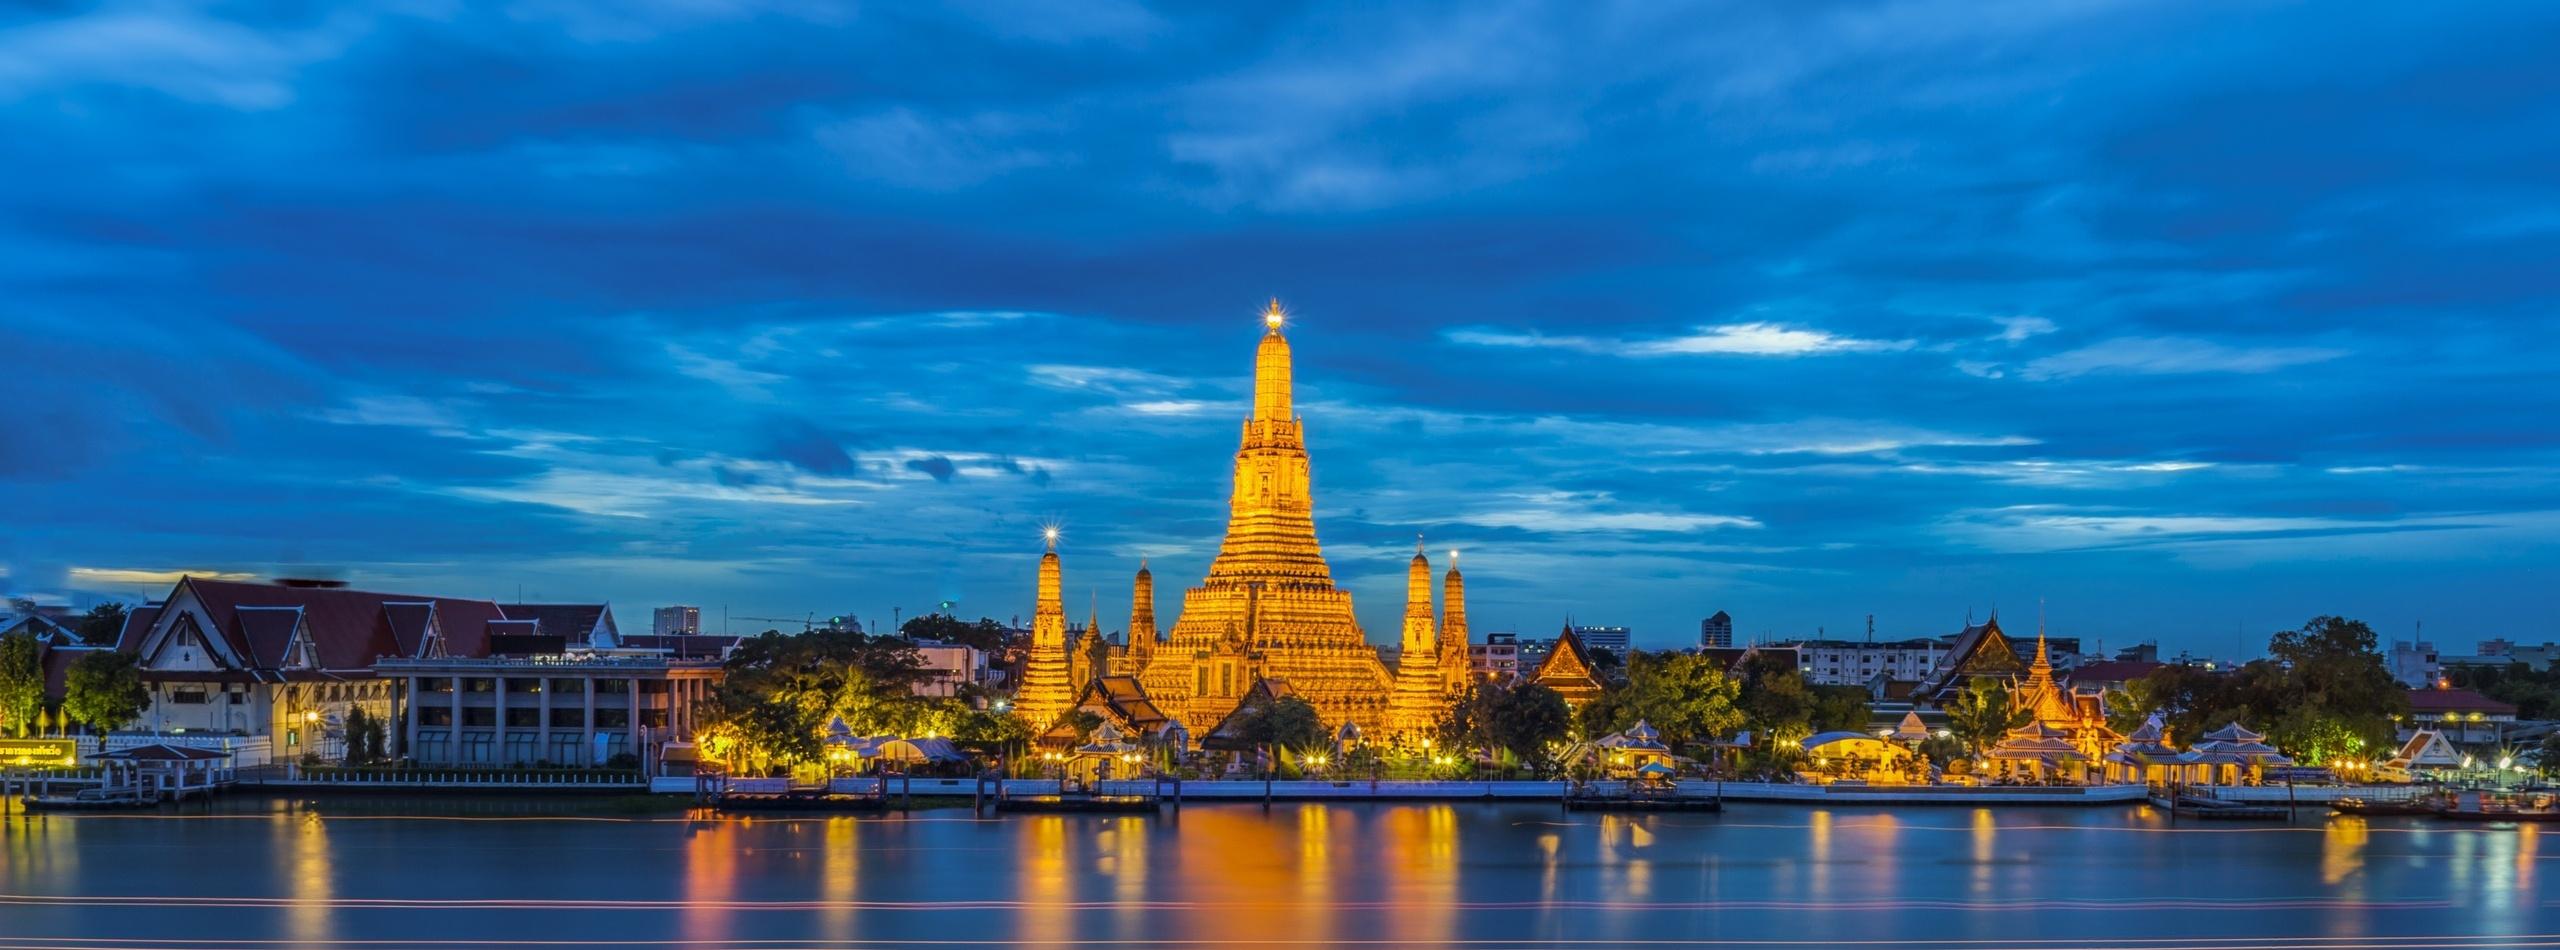 temple_thailand